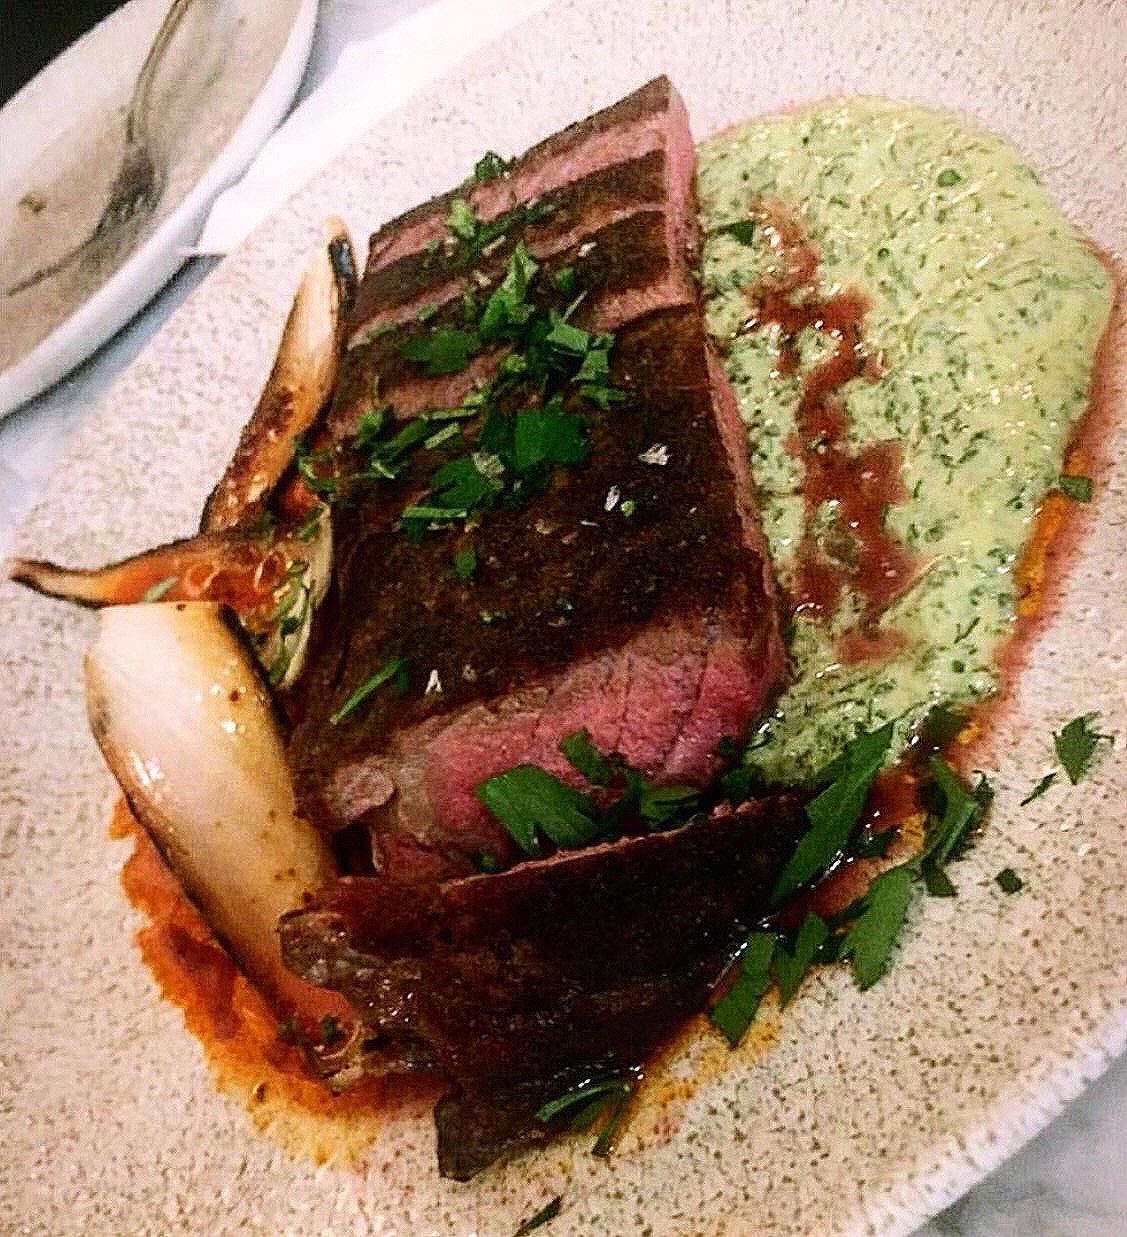 Tony_Ward-Studio_katie_kerl_selfiew_IPhone_steak